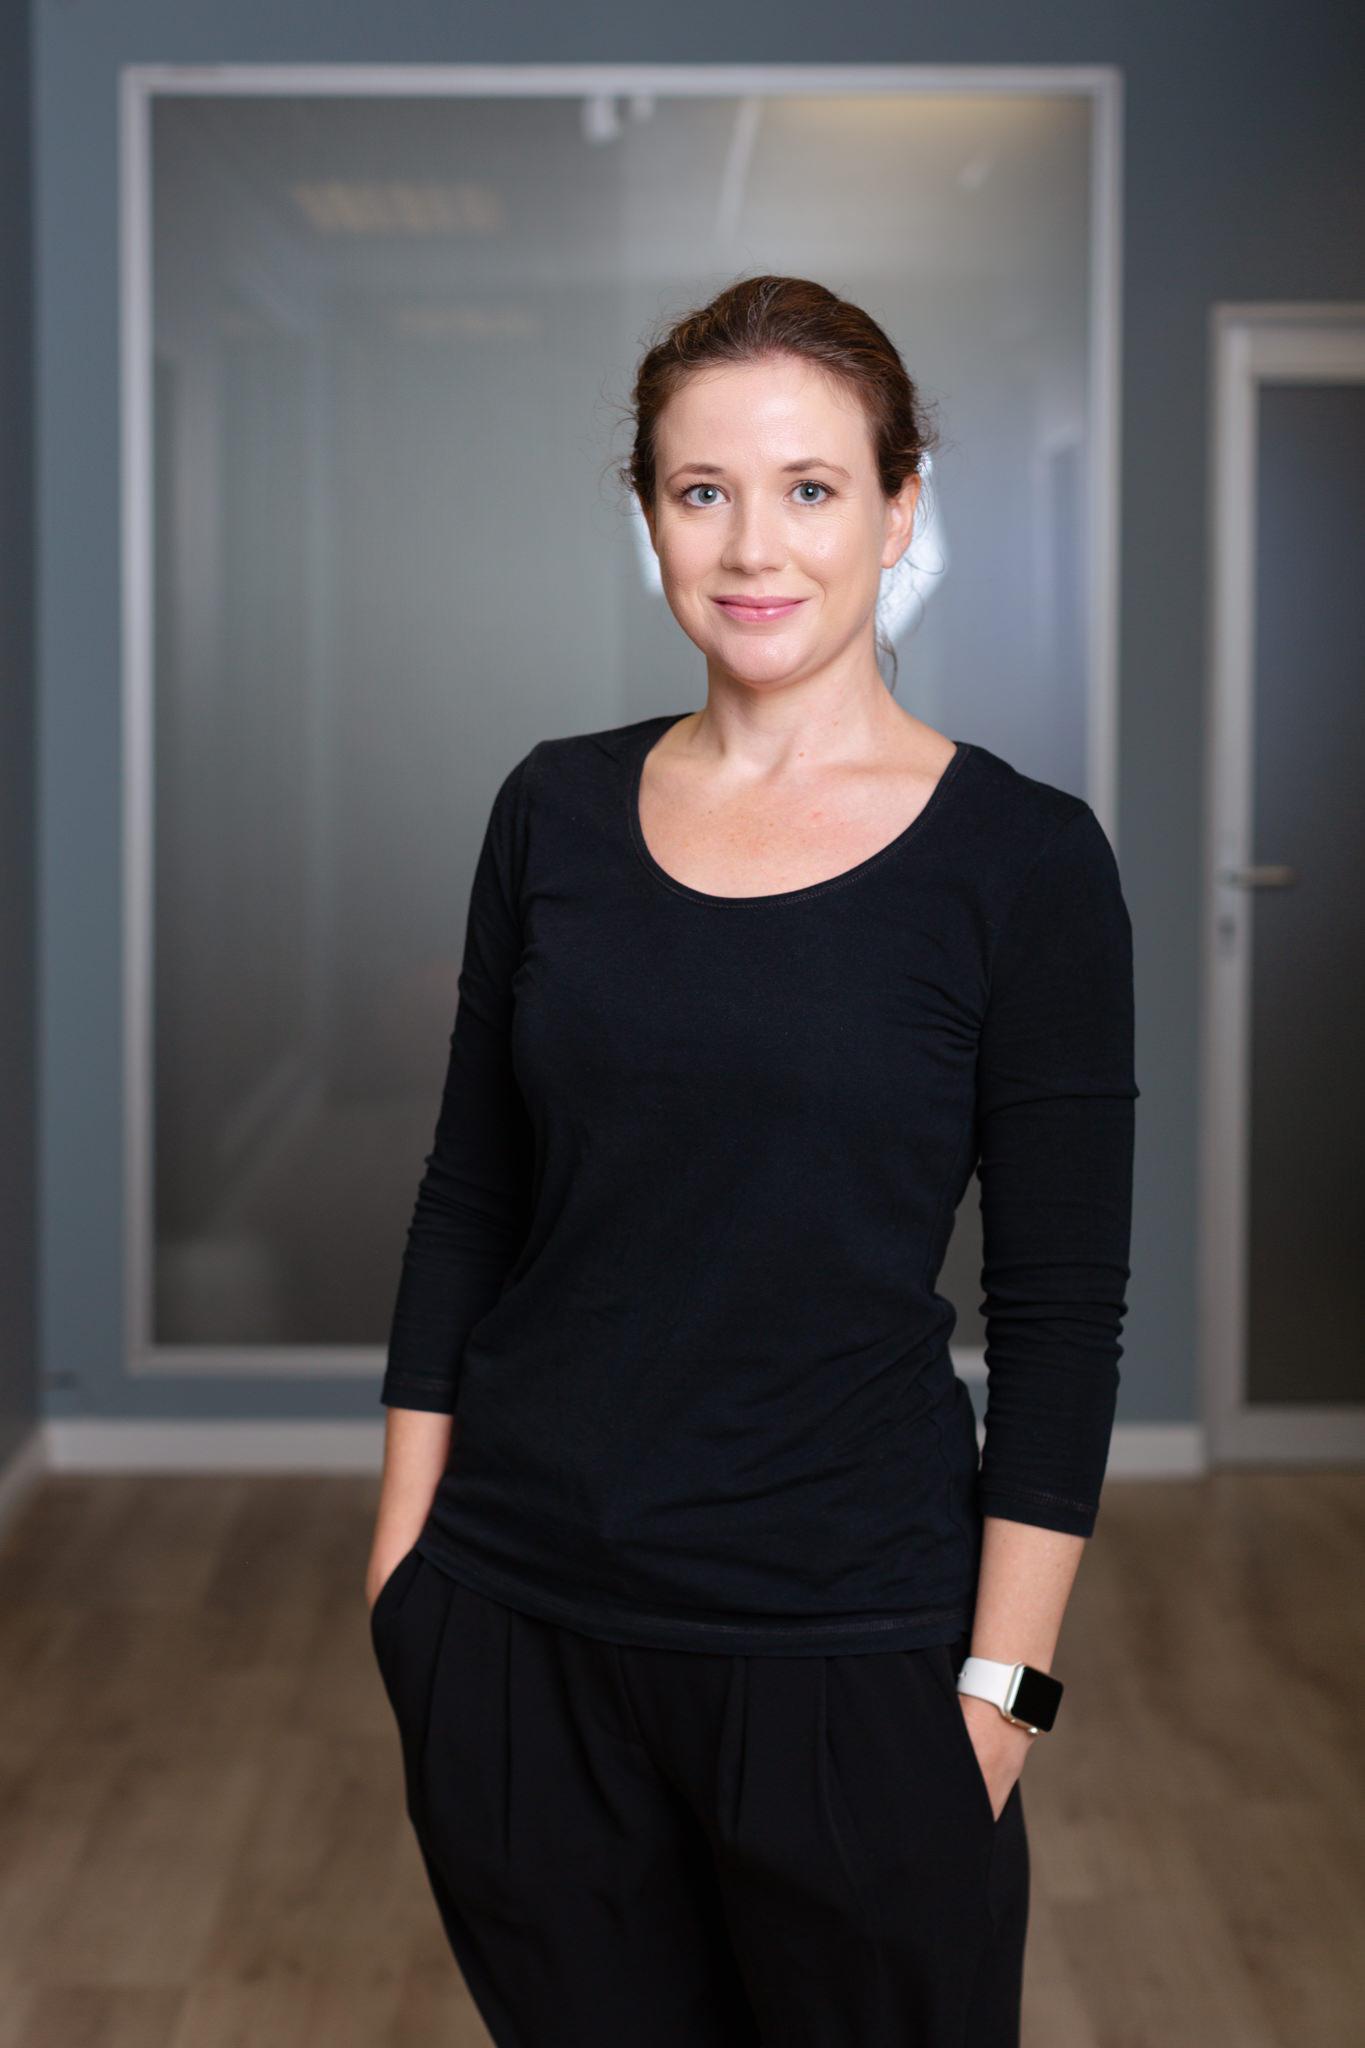 Lisa Bain